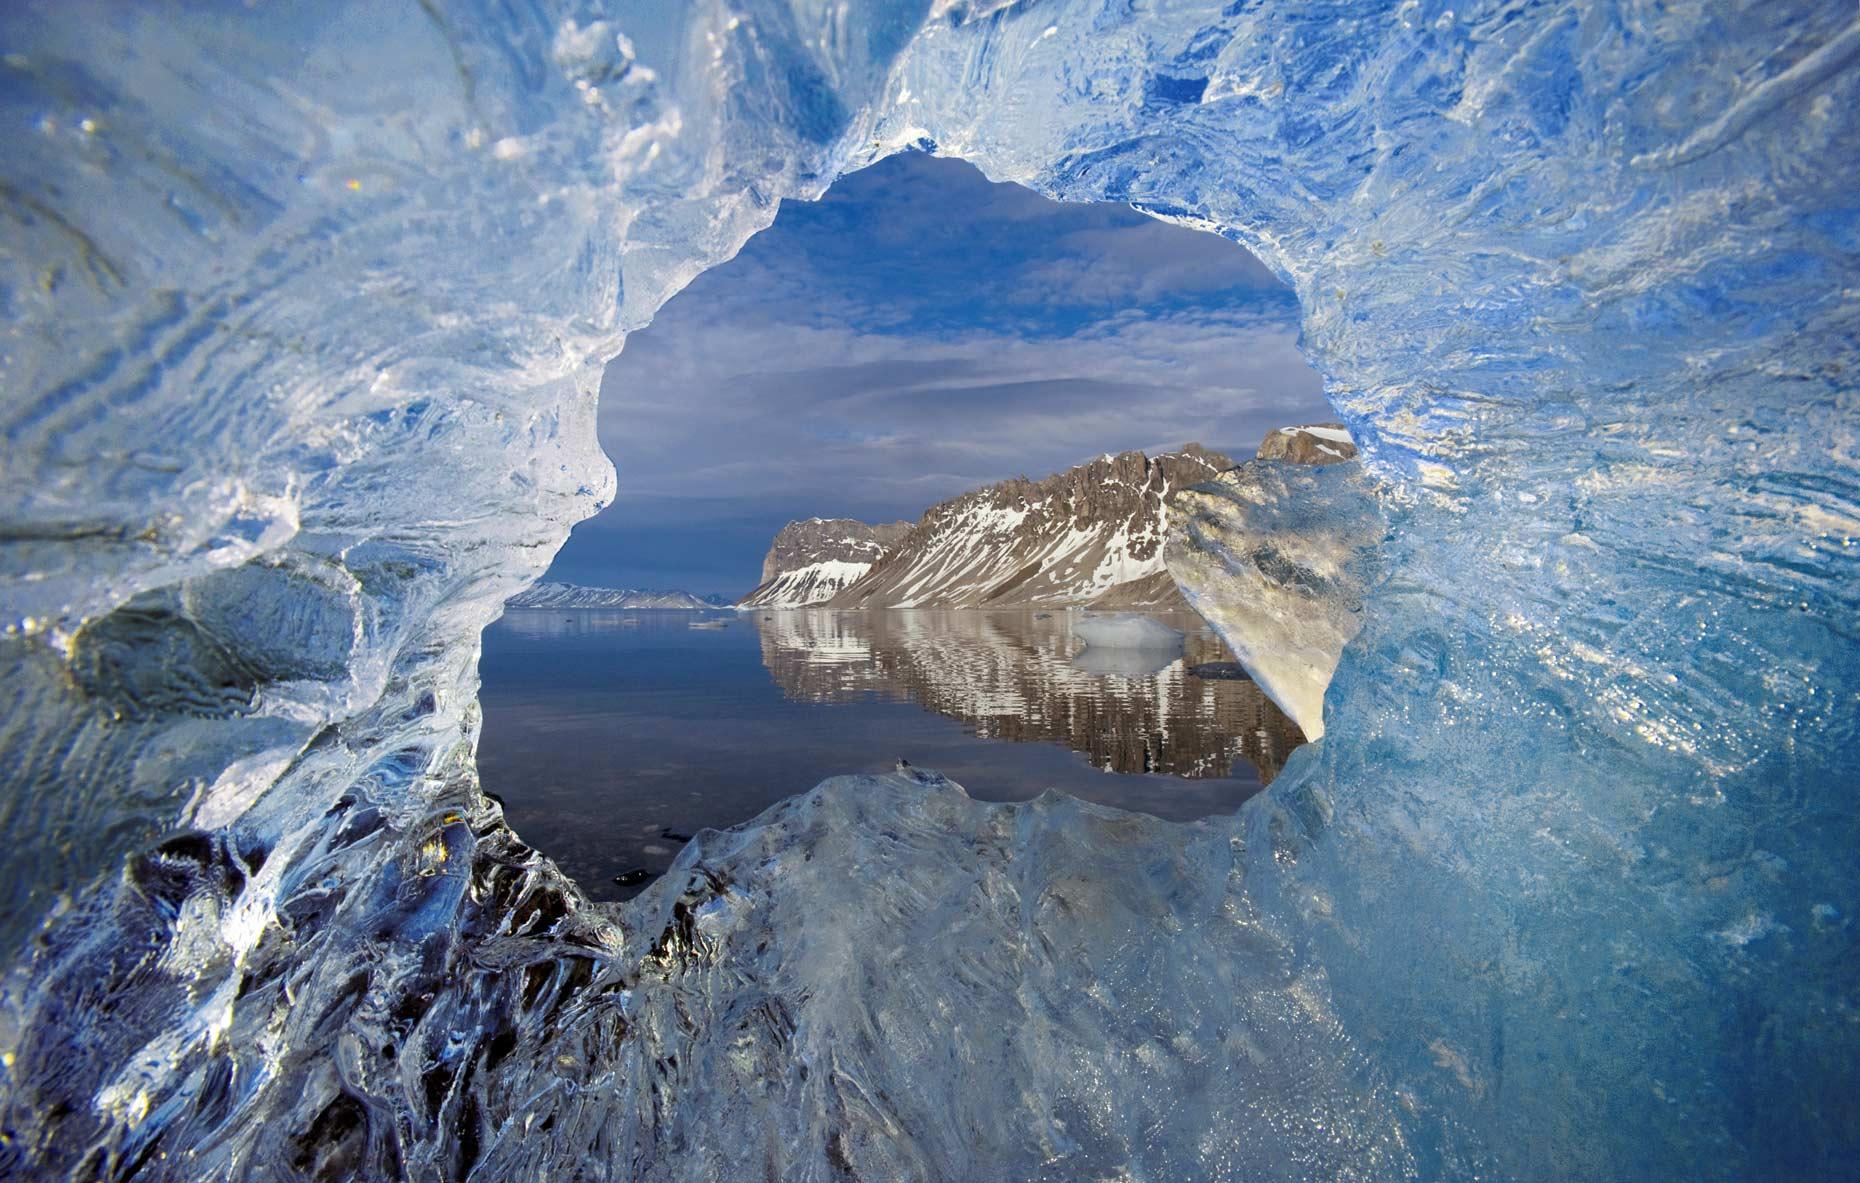 Photo of Площадь льдов в Арктике сократилась до рекордного минимума Площадь льдов в Арктике сократилась до рекордного минимума Площадь льдов в Арктике сократилась до рекордного минимума Photo by Paul Nicklen 29